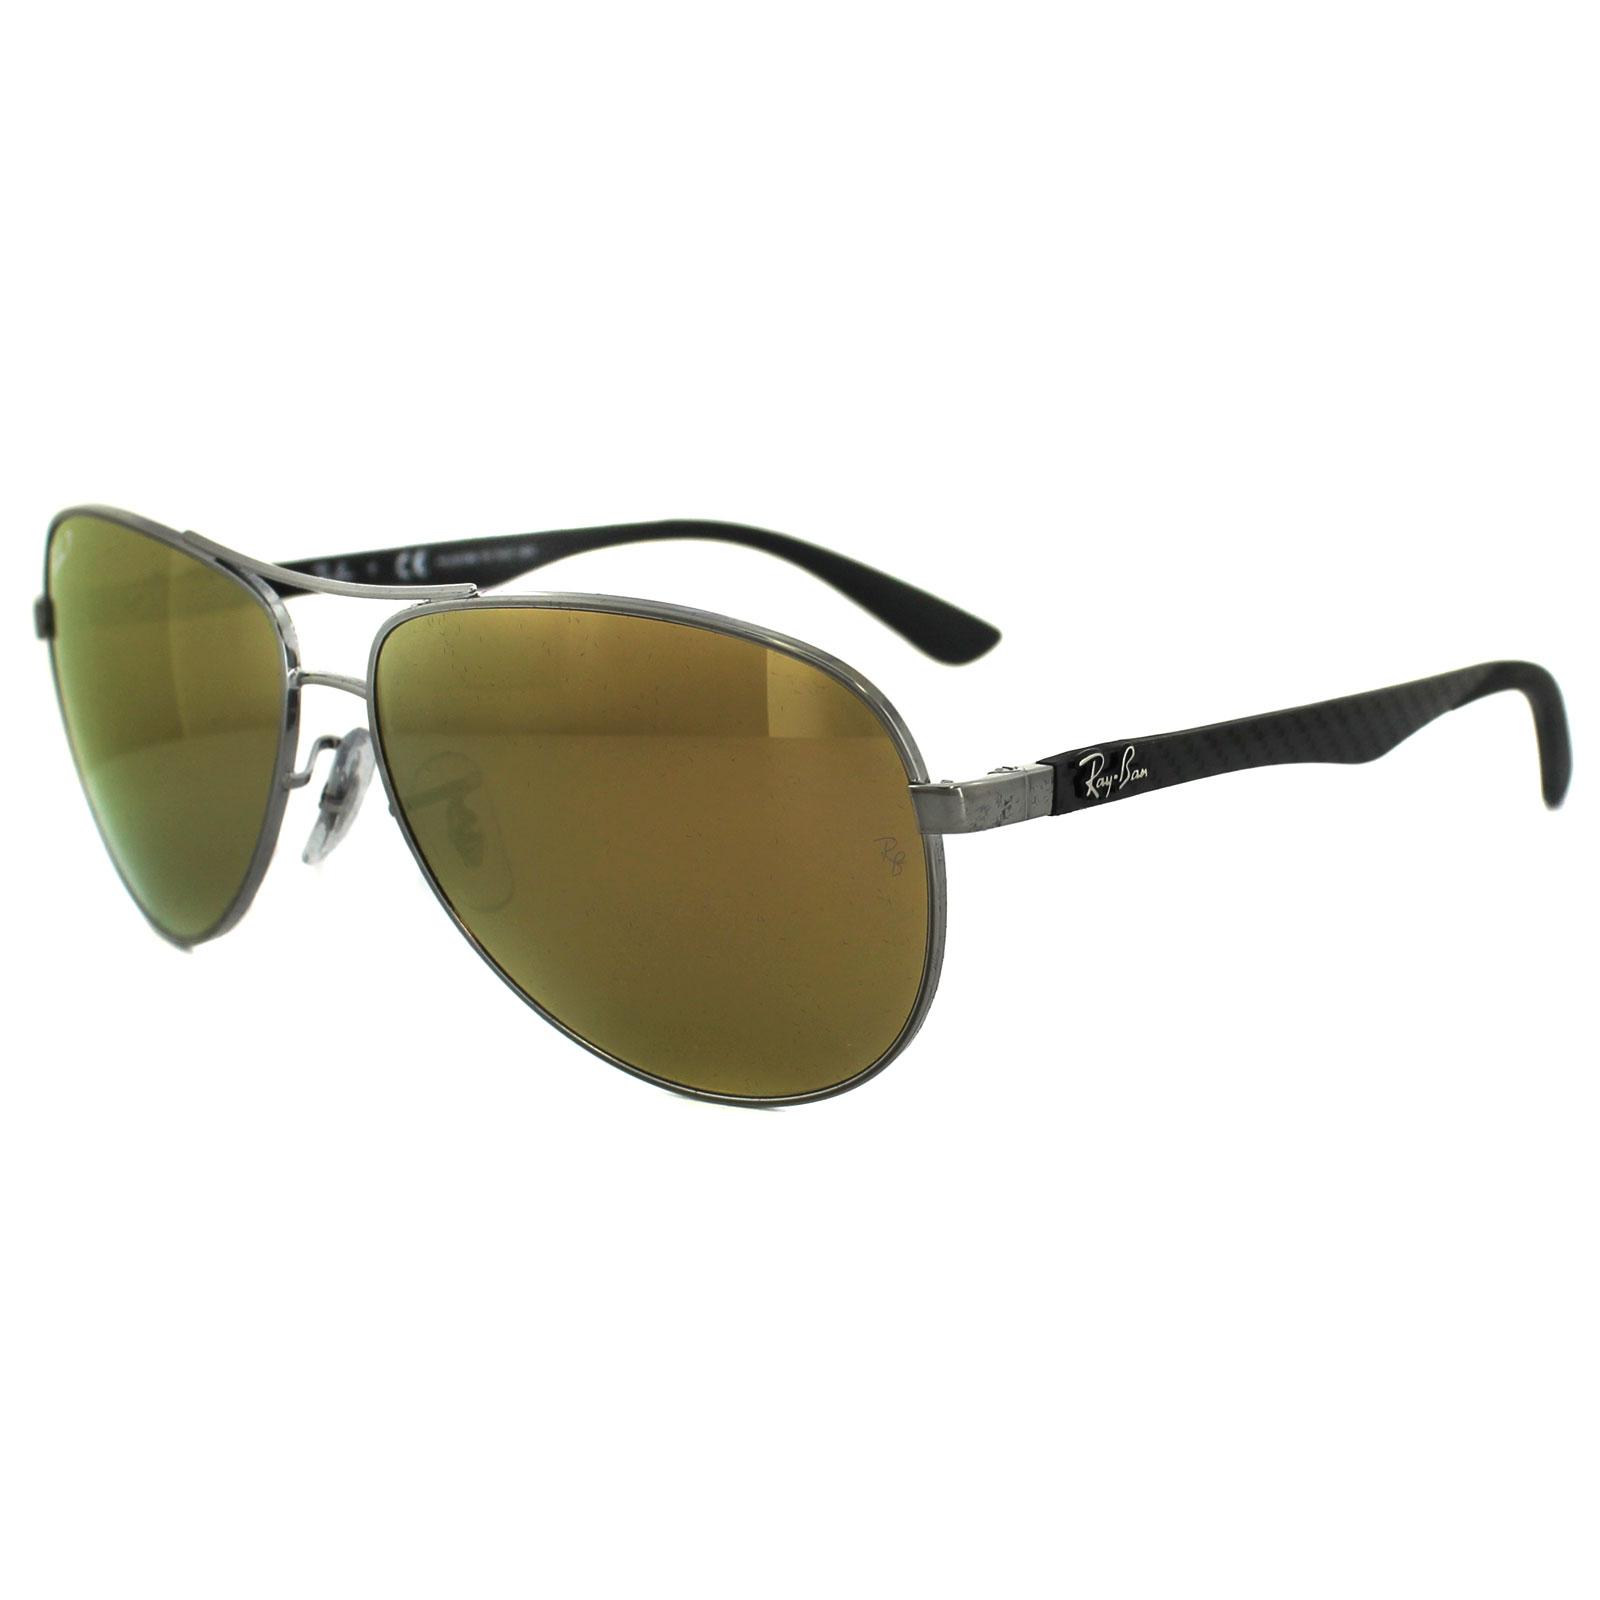 1bc26f81ef Sentinel Ray-Ban Sunglasses 8313 004 N3 Gunmetal Polarized Gold Mirror 61mm